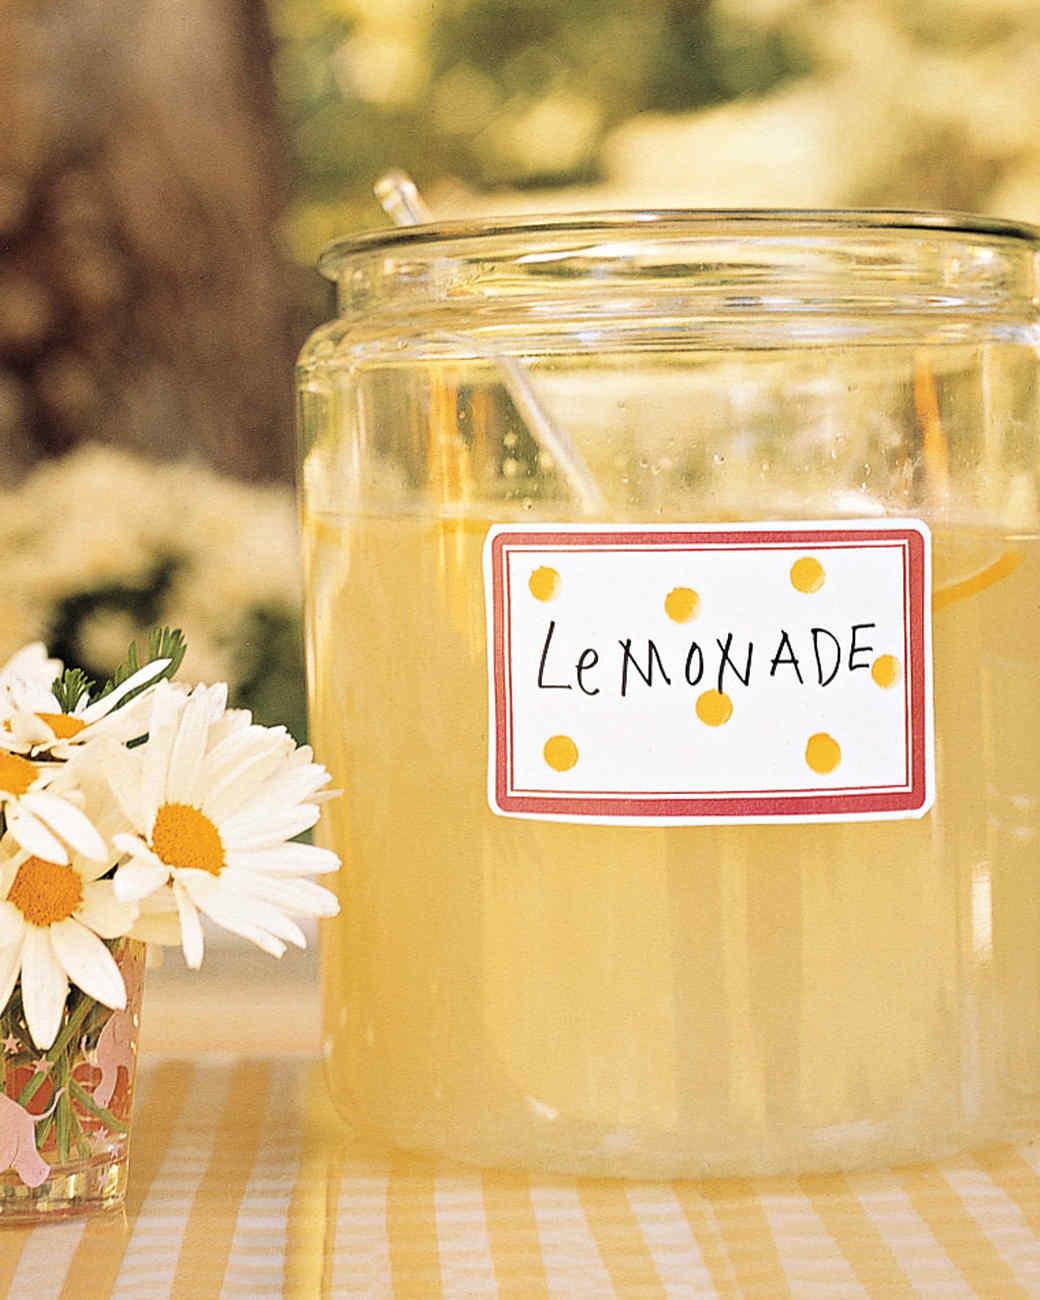 daisys-birthday-ma101007-lemonade02.jpg